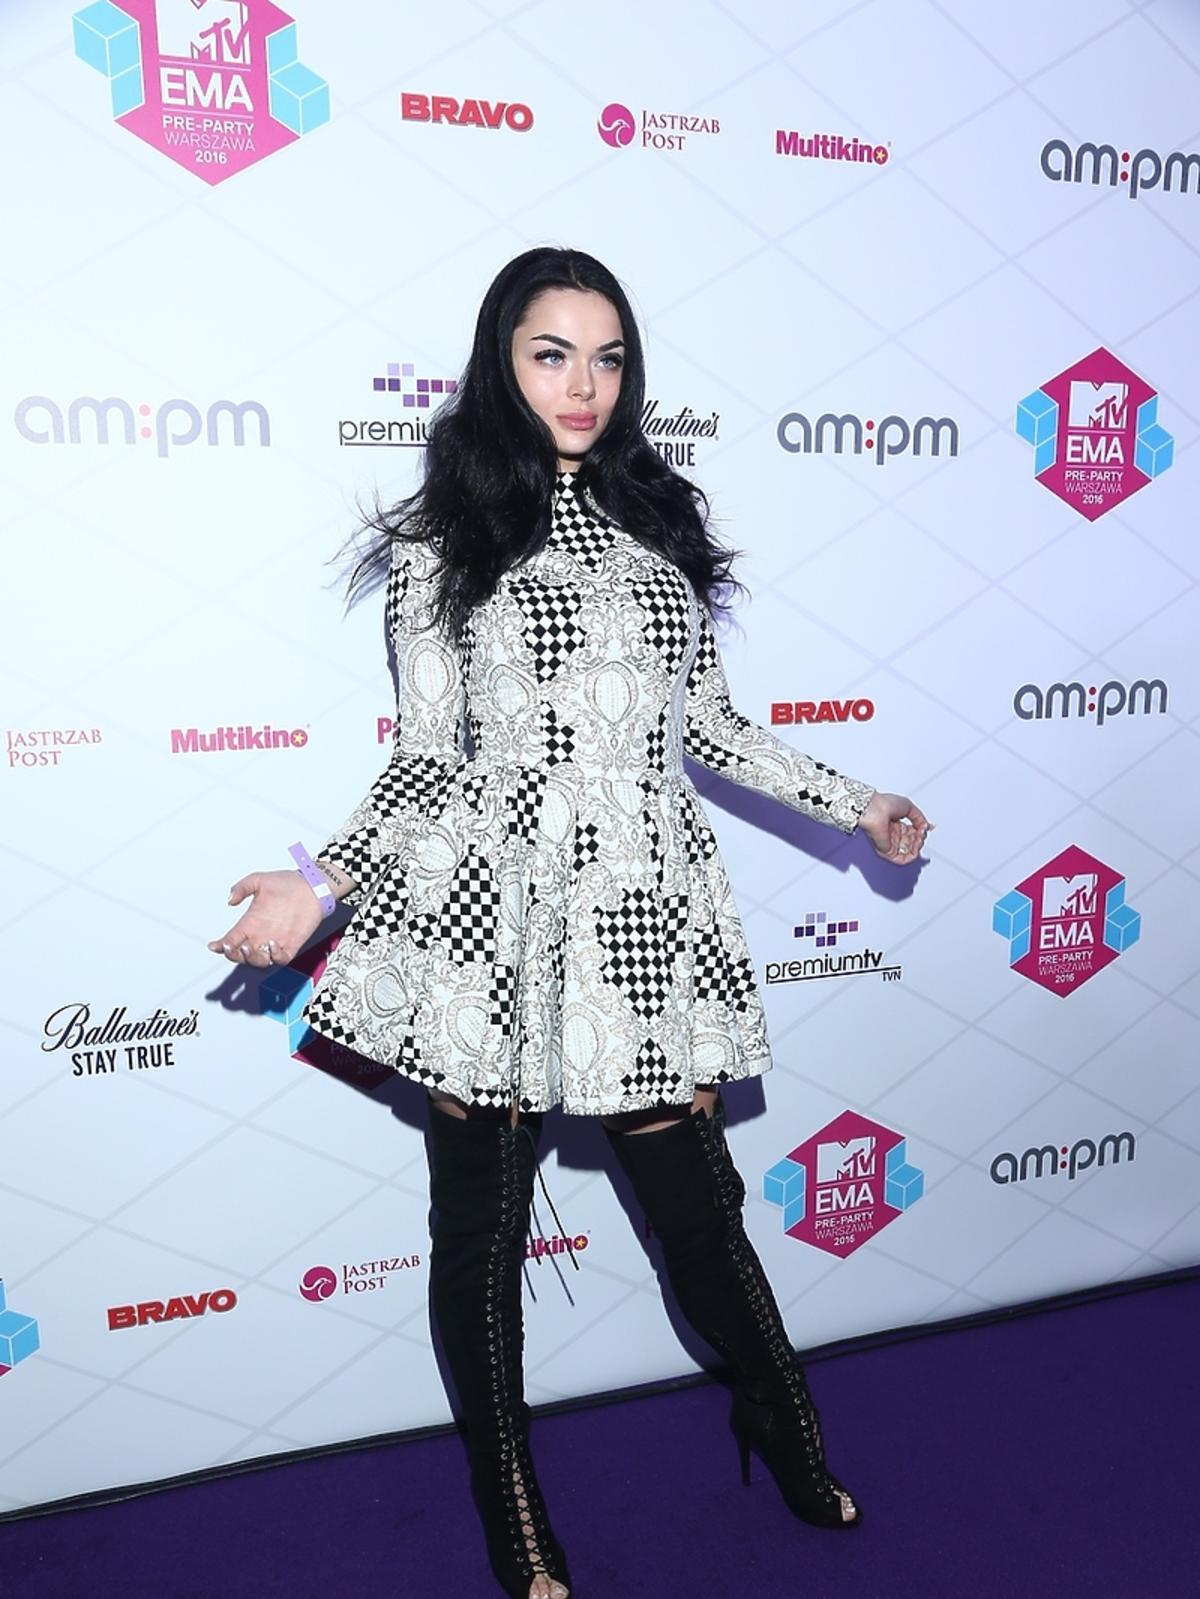 MTV EMA Pre-Party, Luxuria Astaroth